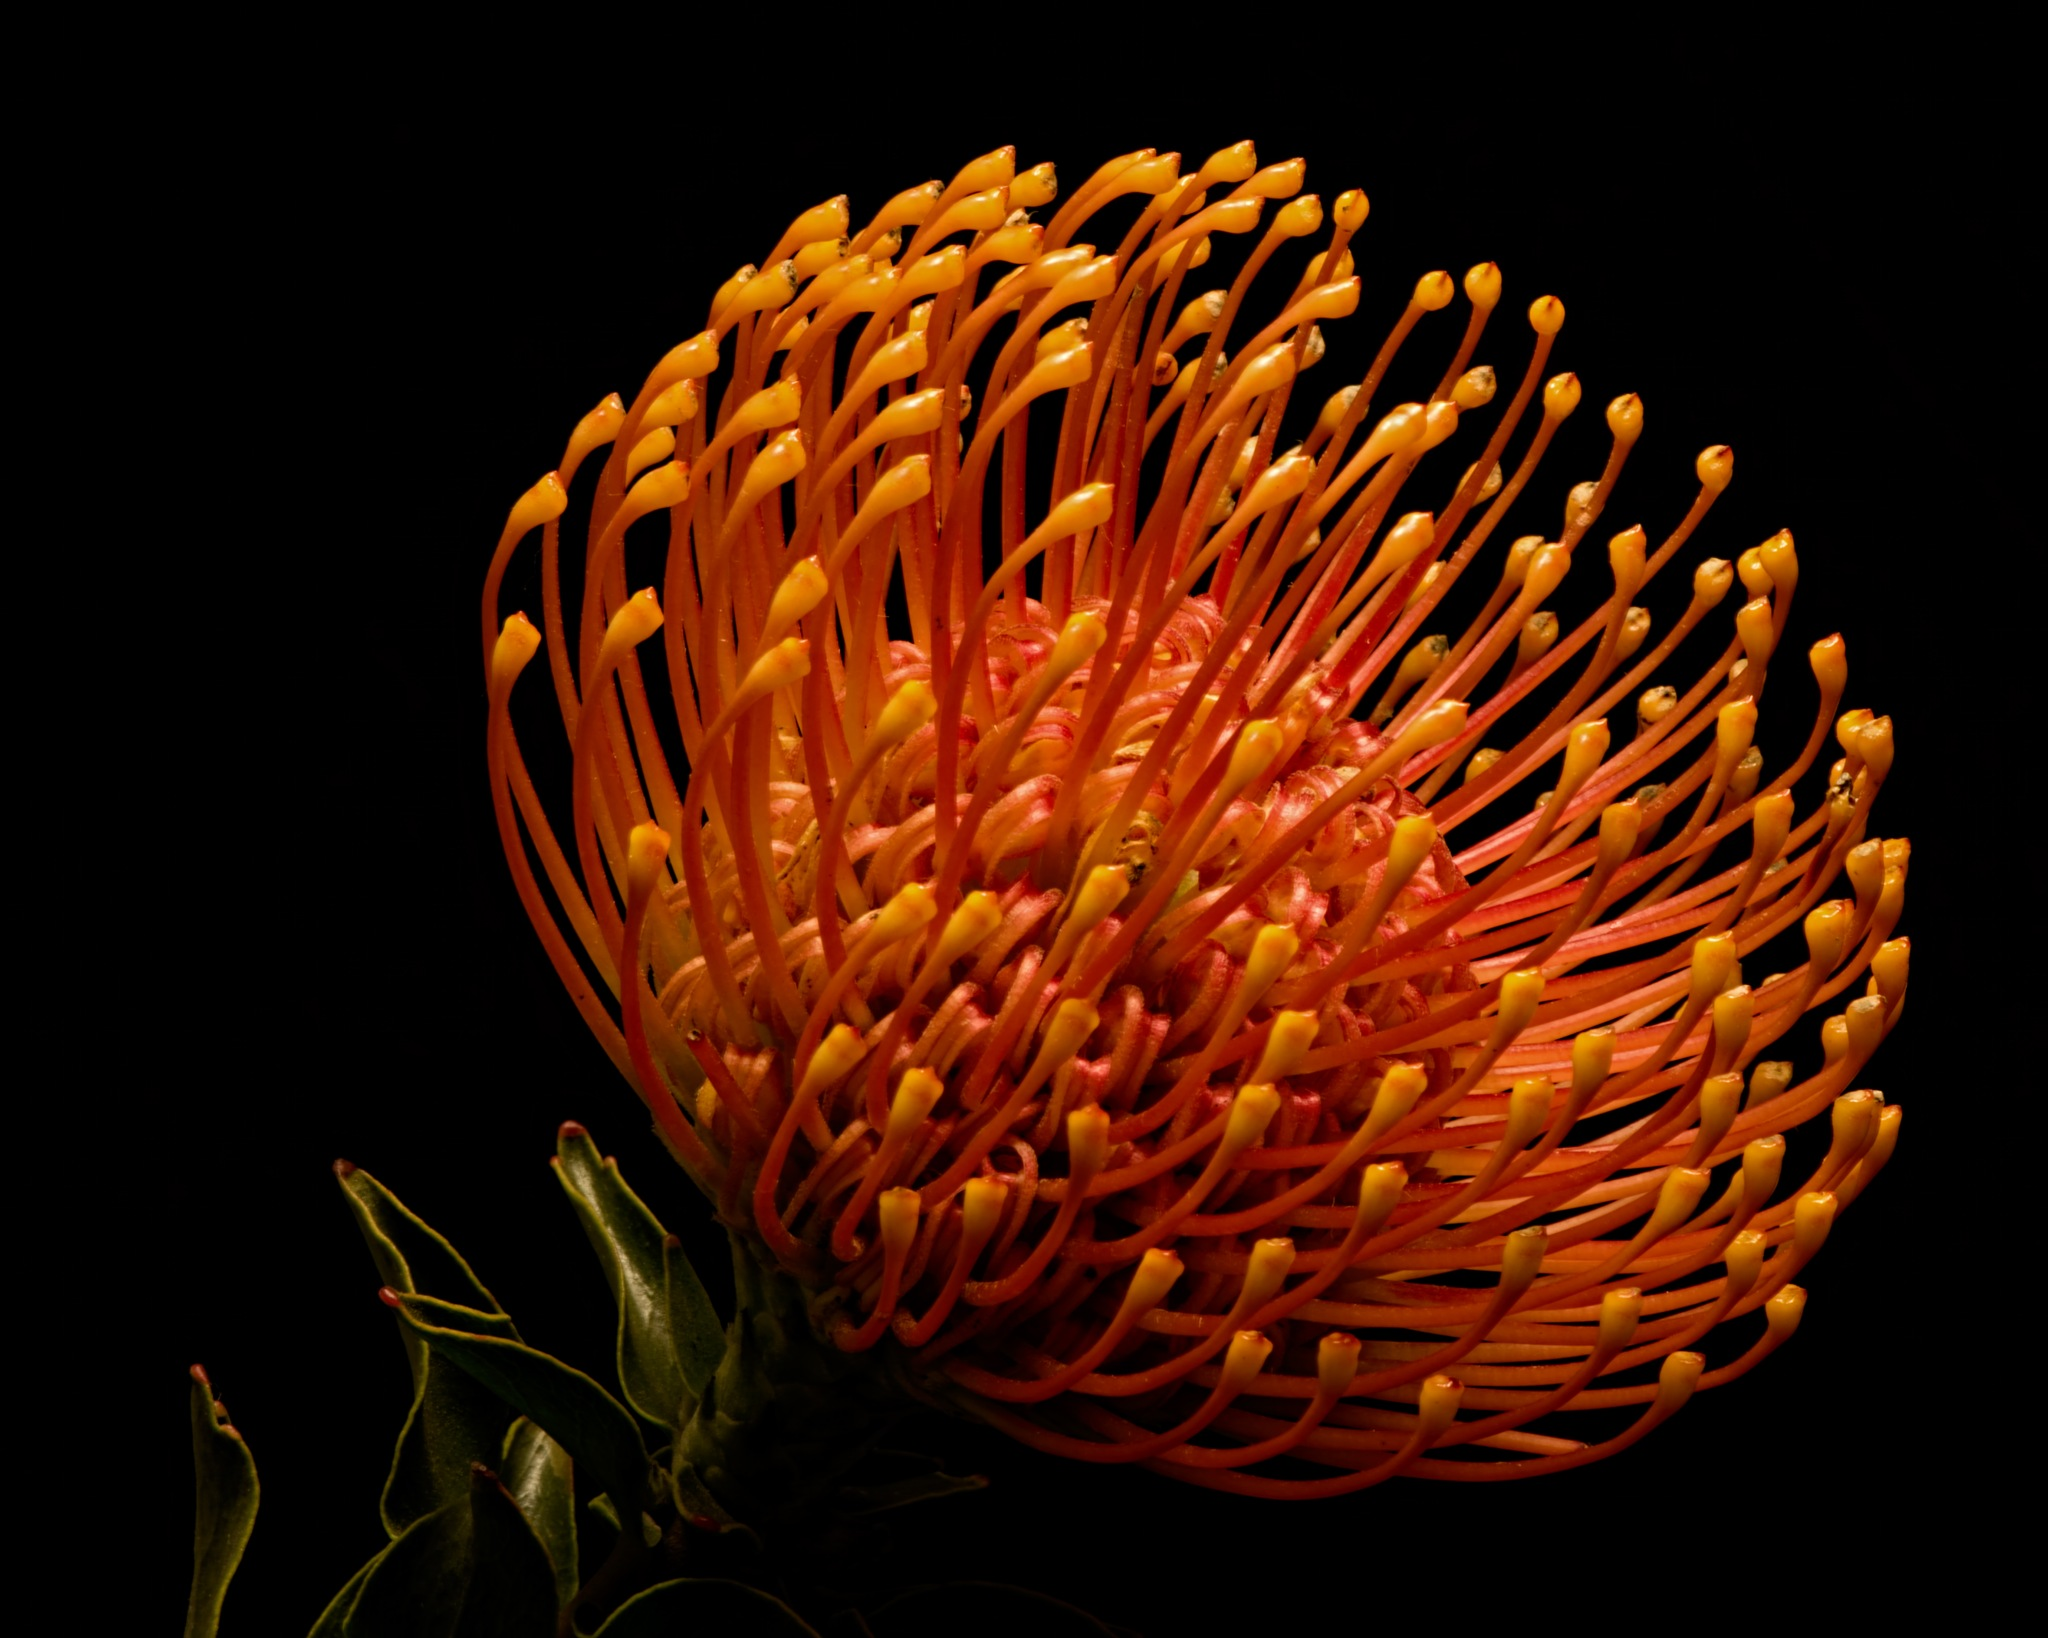 Orange Pincushion Protea 0604 by ThomasJerger